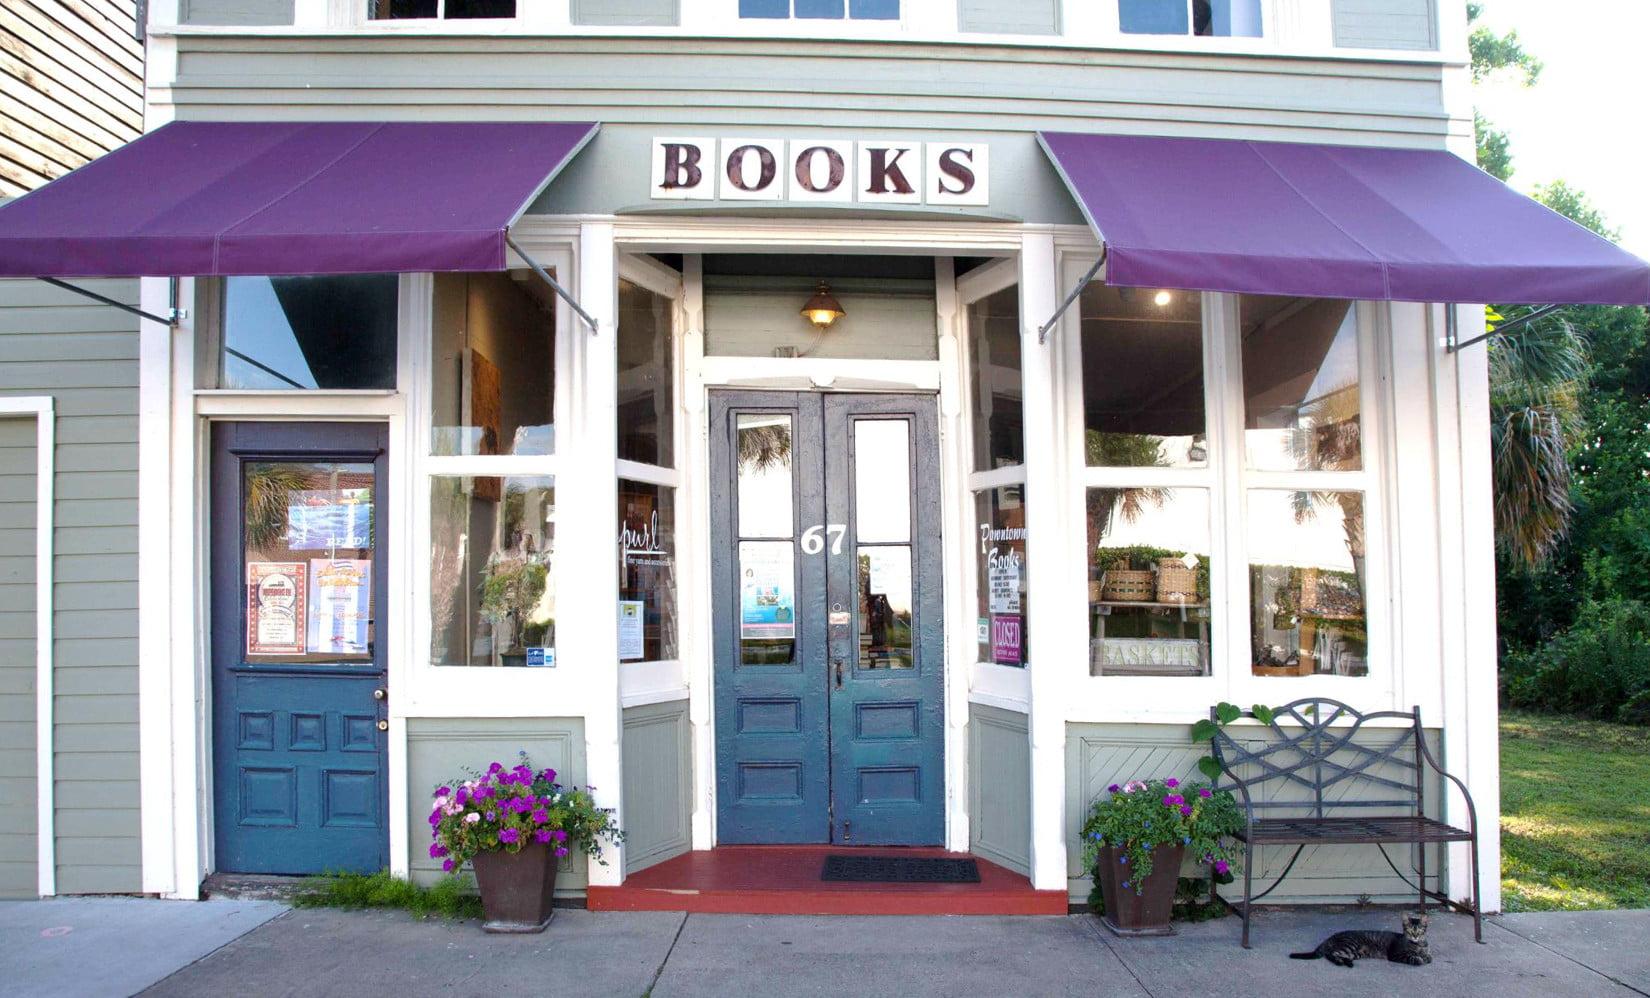 Downtown Books Apalachicola FL